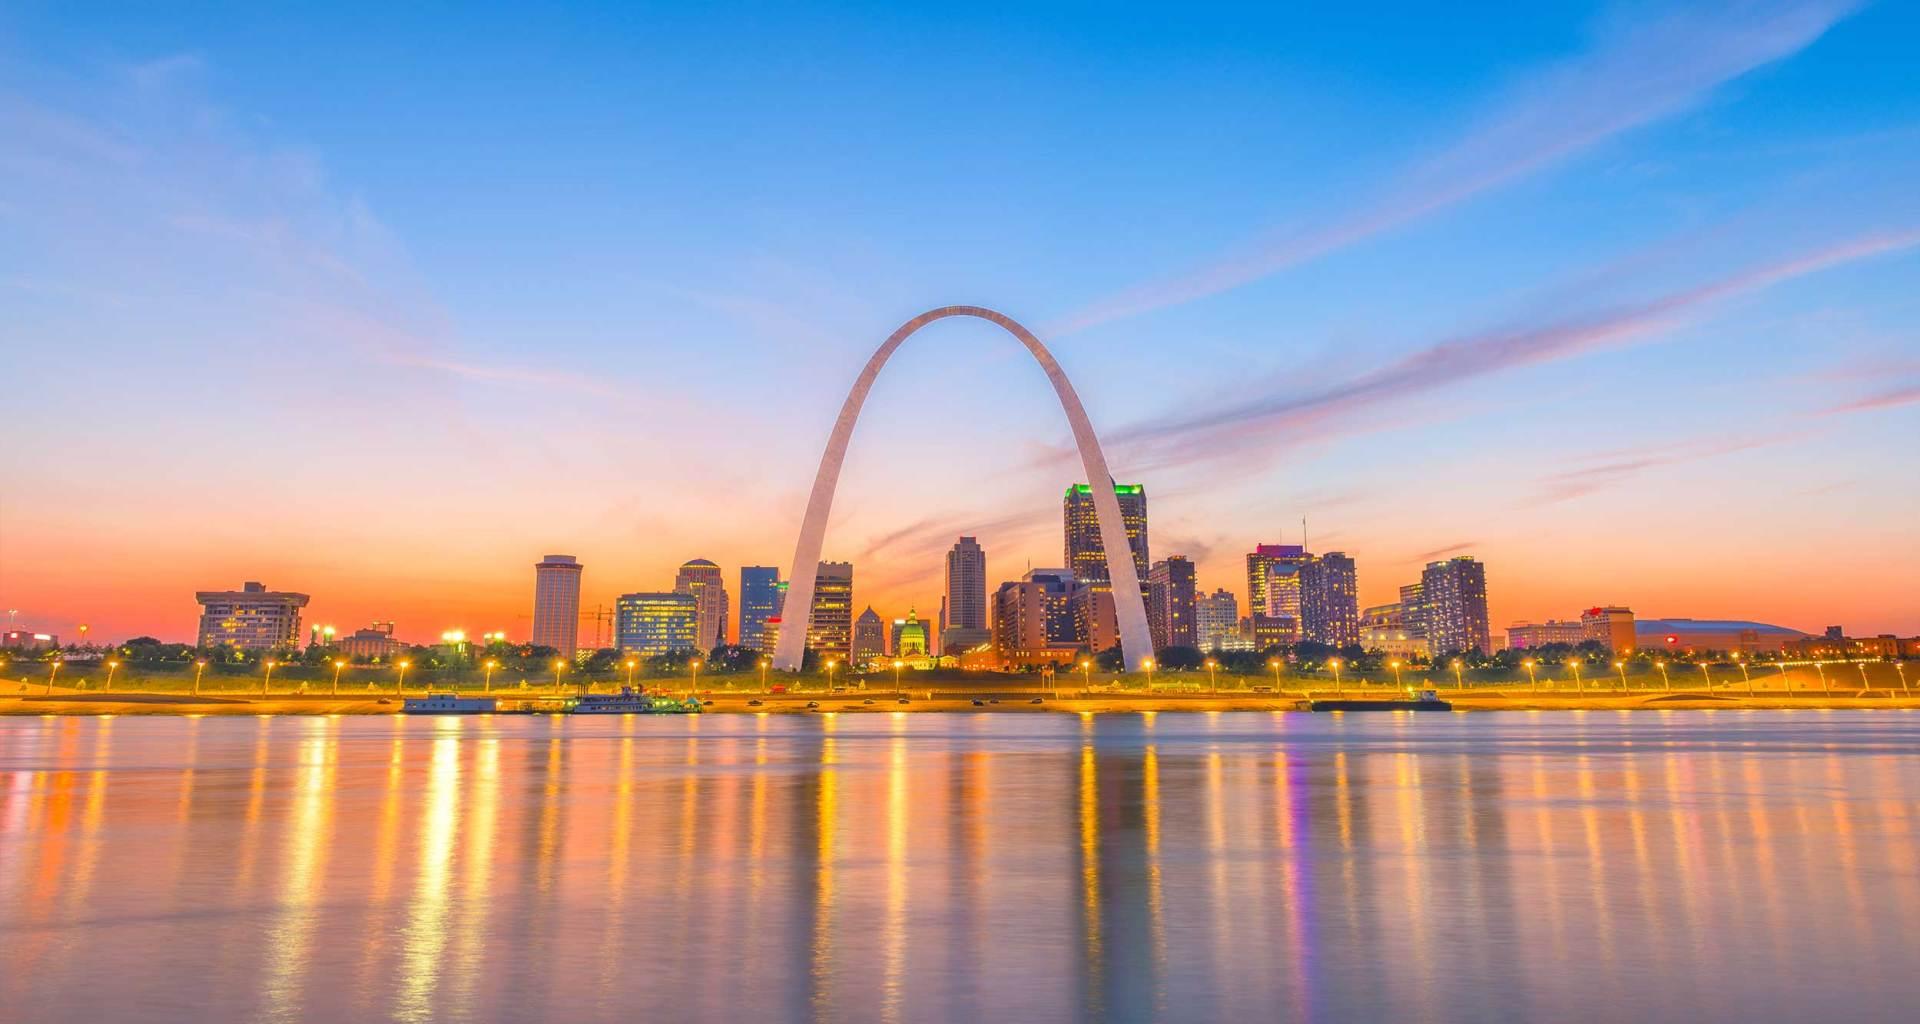 St. Louis, Missouri skyline.